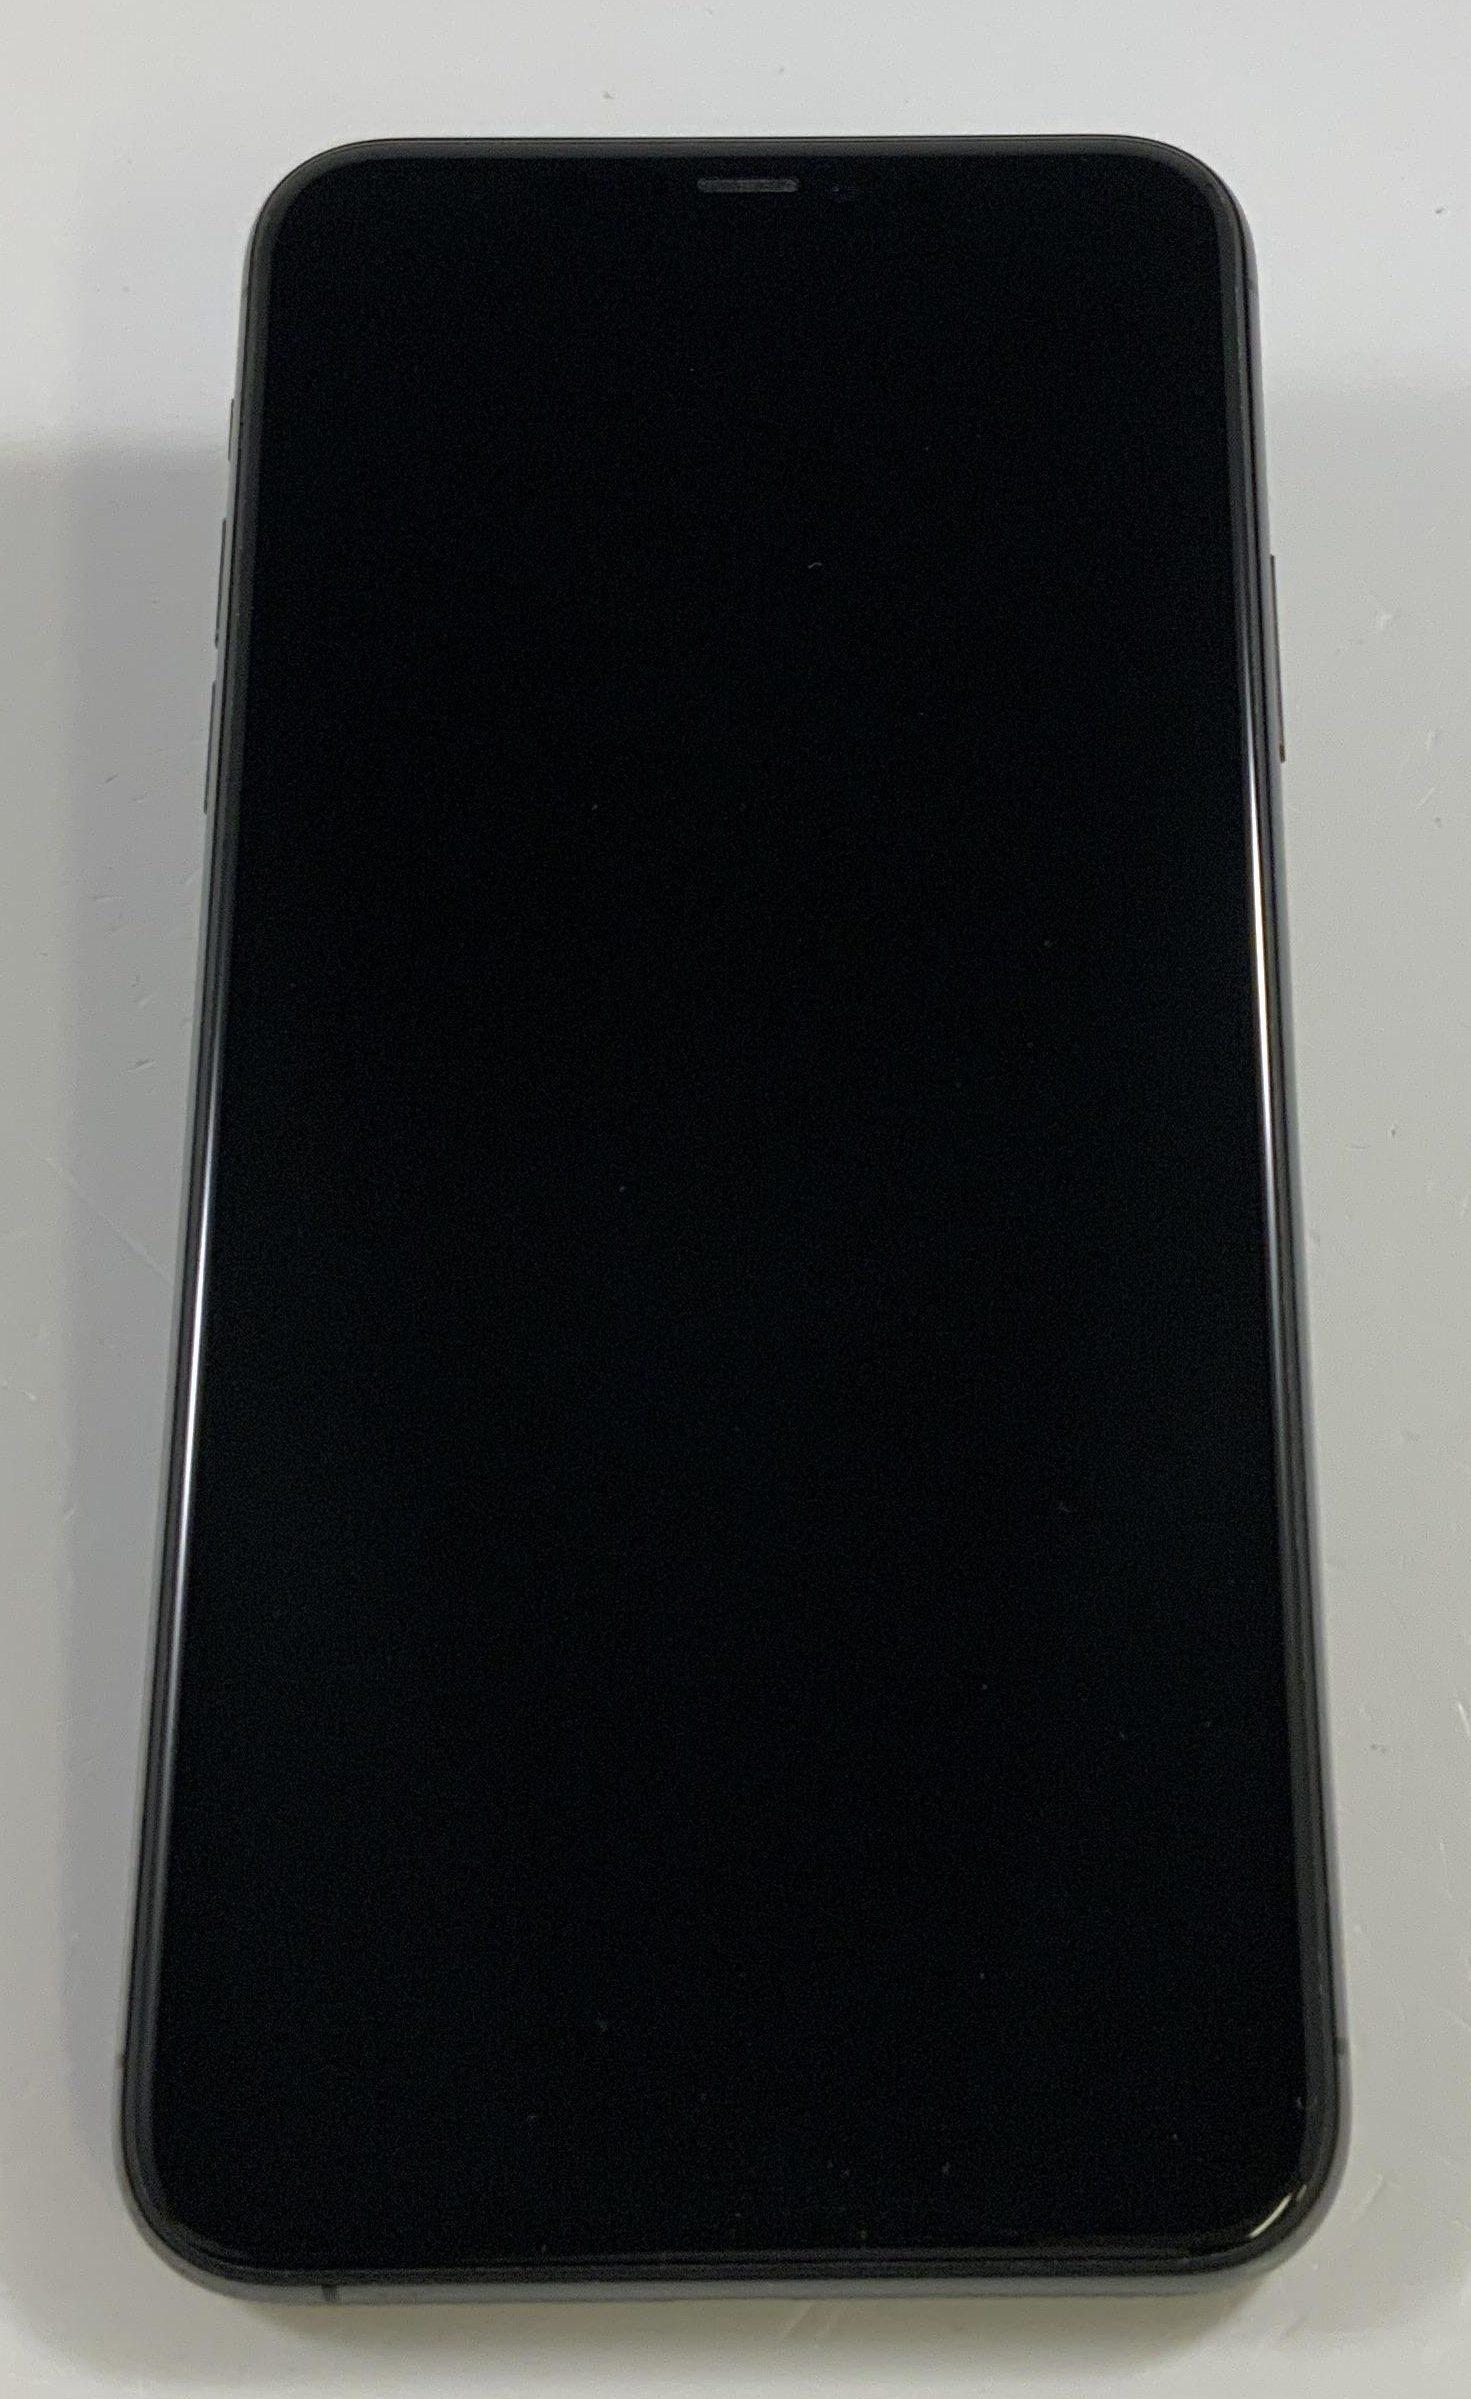 iPhone 11 Pro Max 64GB, 64GB, Space Gray, imagen 1